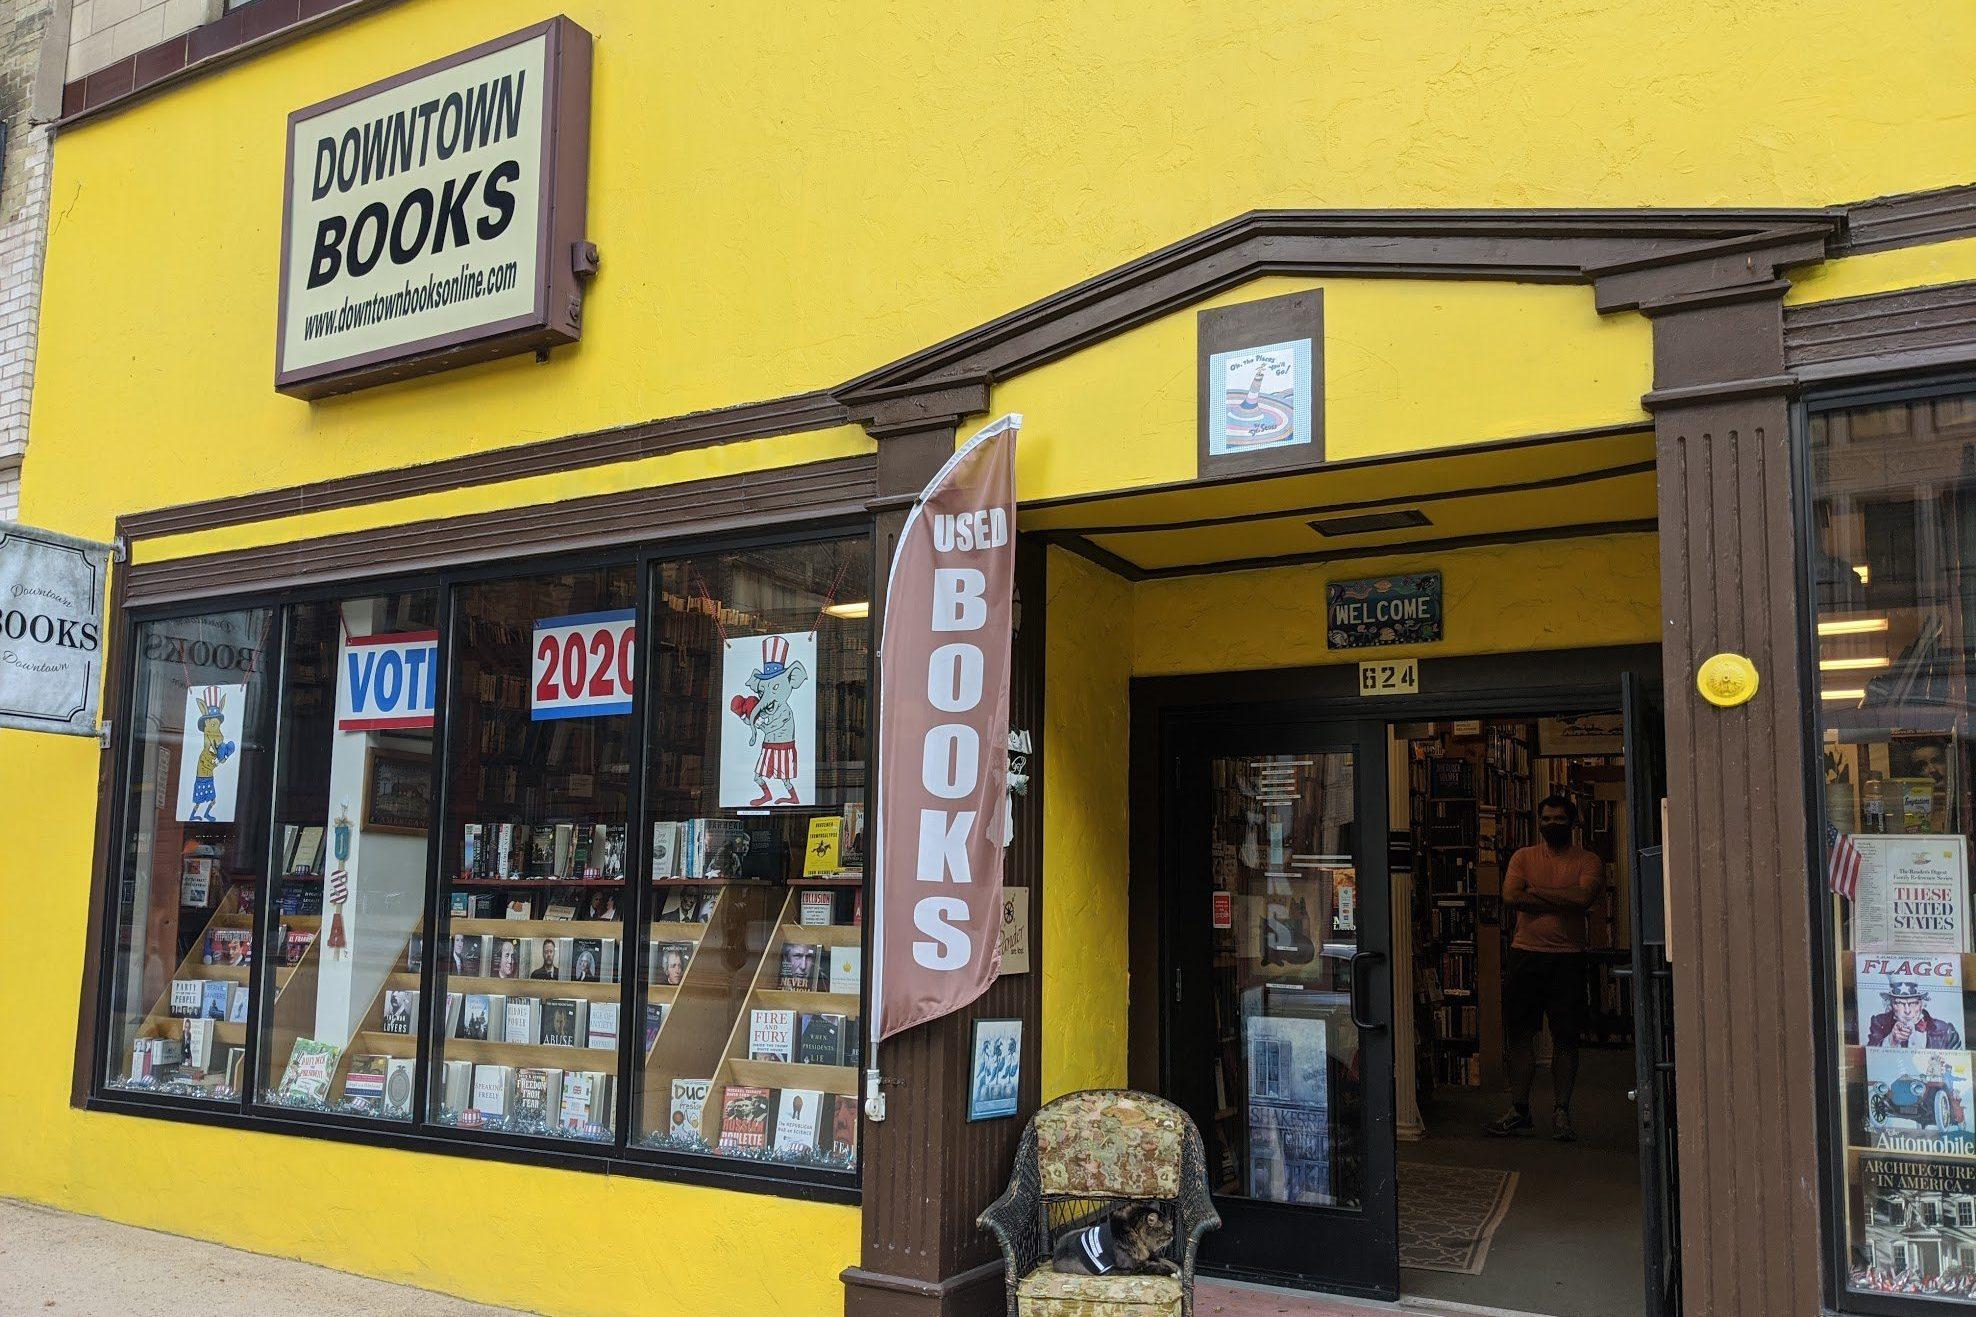 Downtown books in Milwaukee, Wisconsin